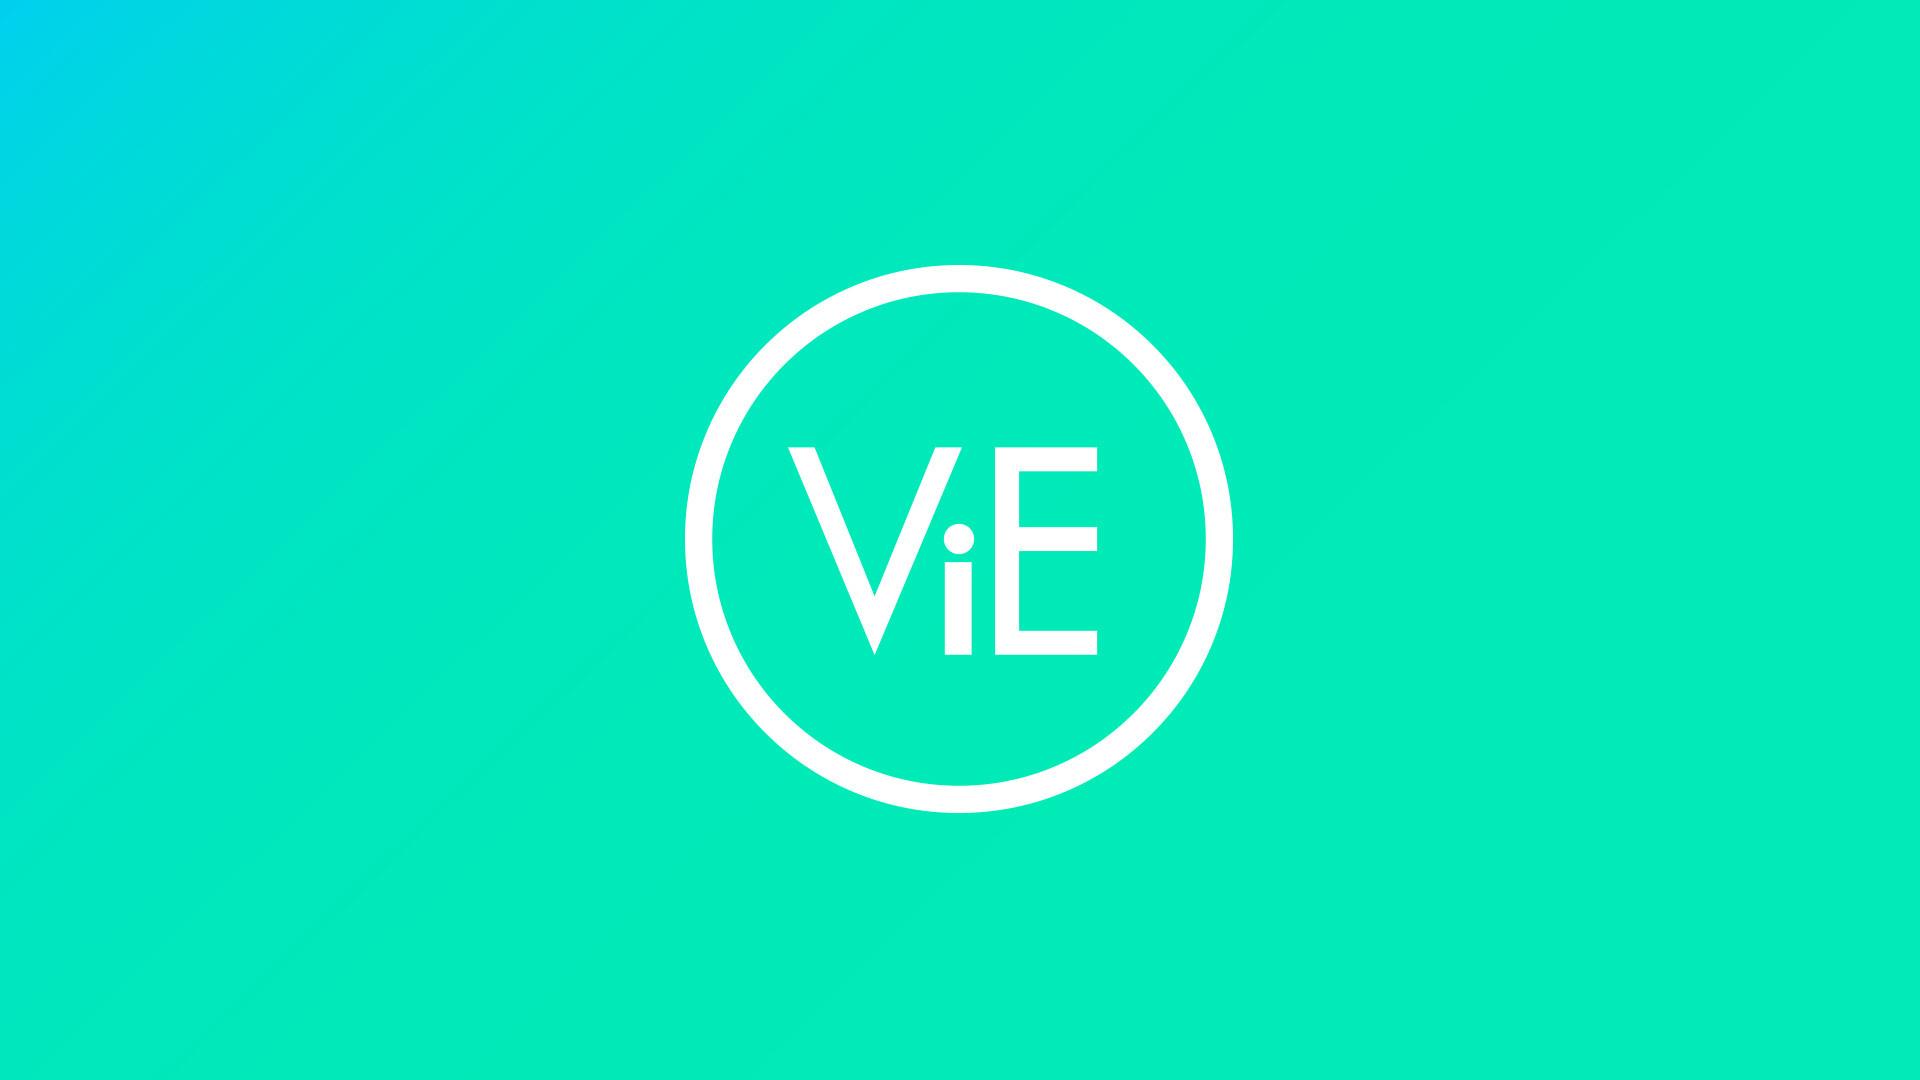 vie-brand-5c6599e957060.jpg